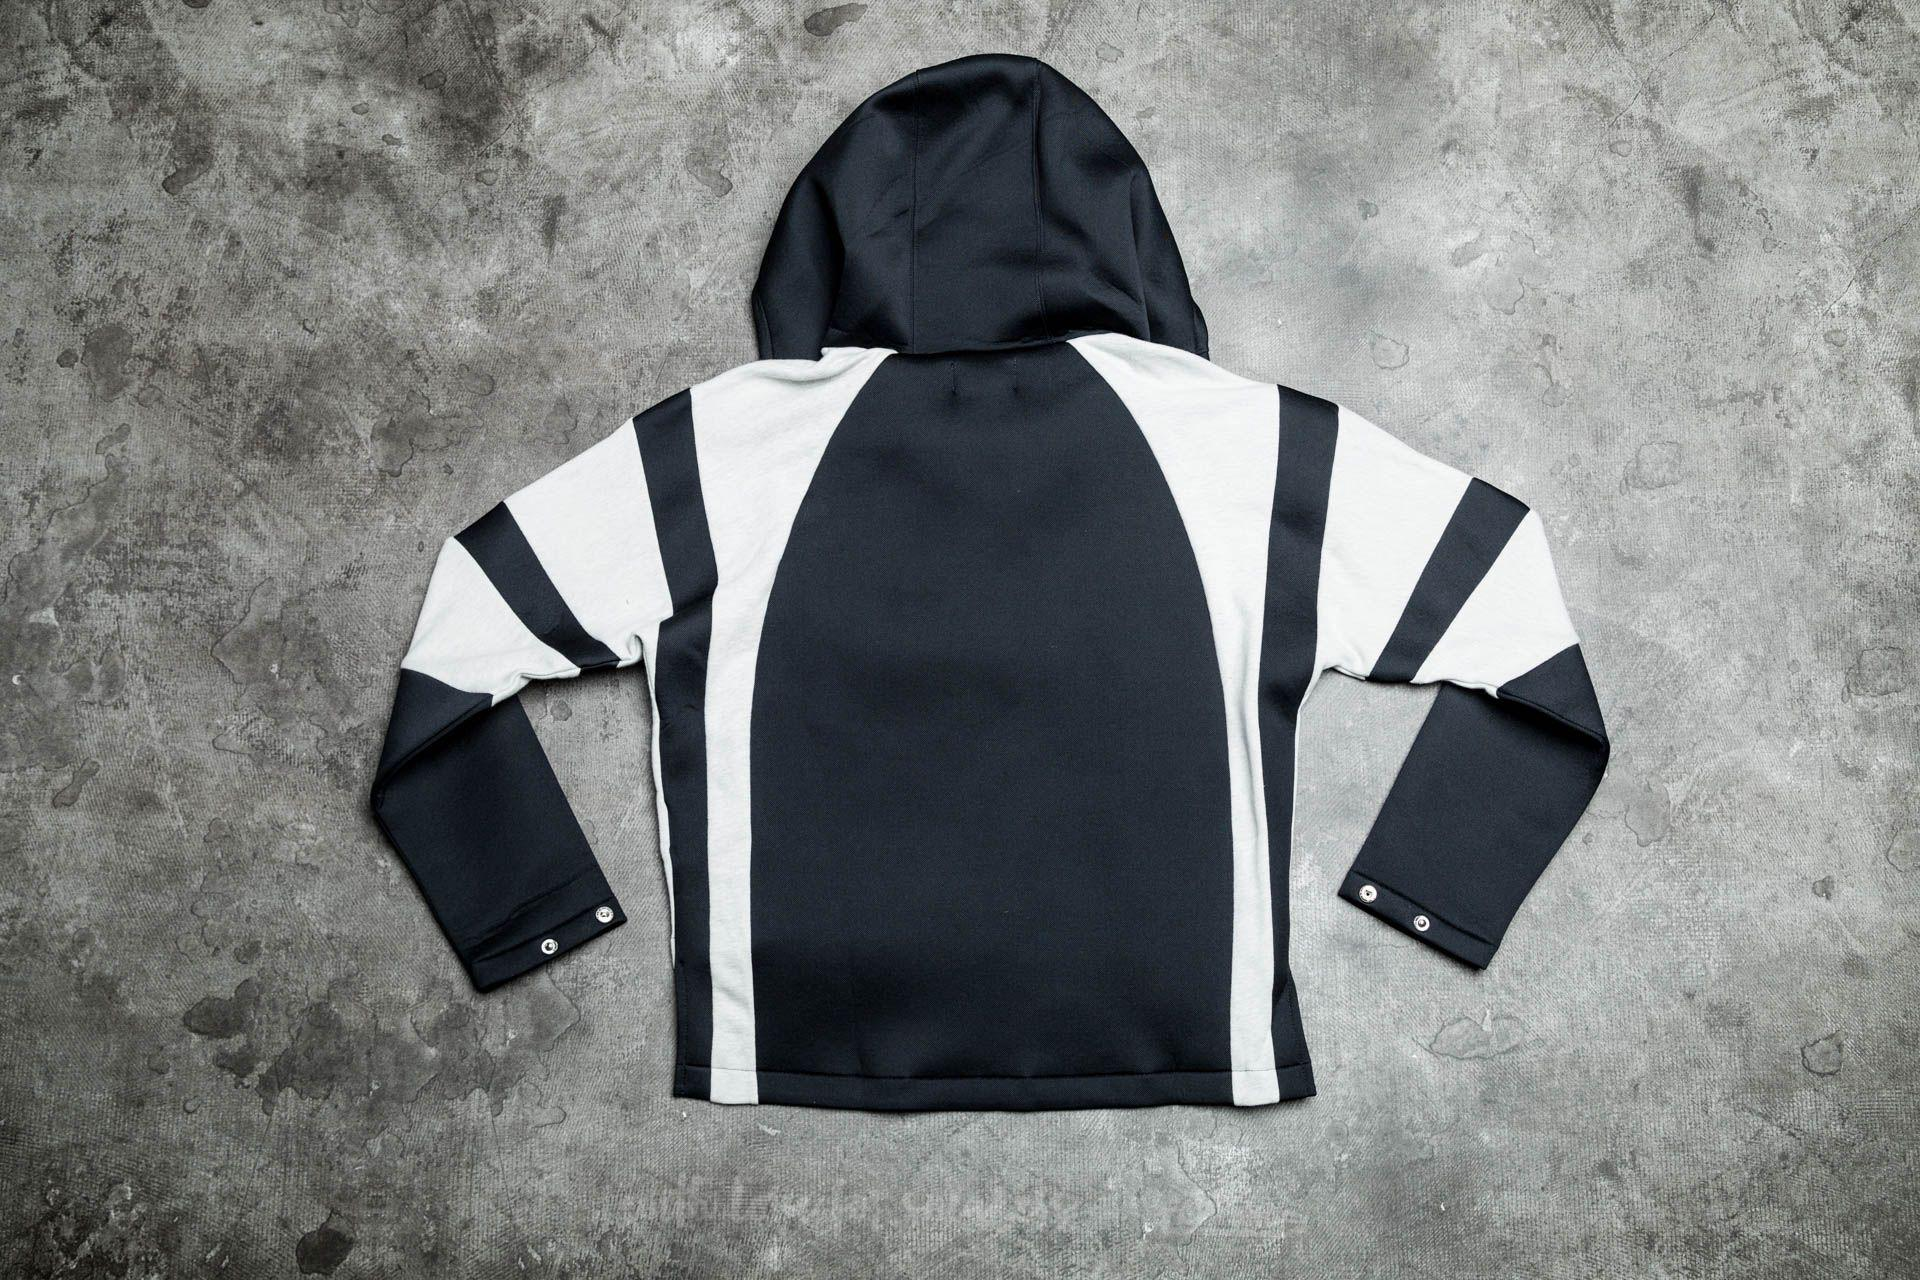 bf6816fb4986 Lyst - Adidas Originals Adidas Equipment Hoodie Black in Black for Men